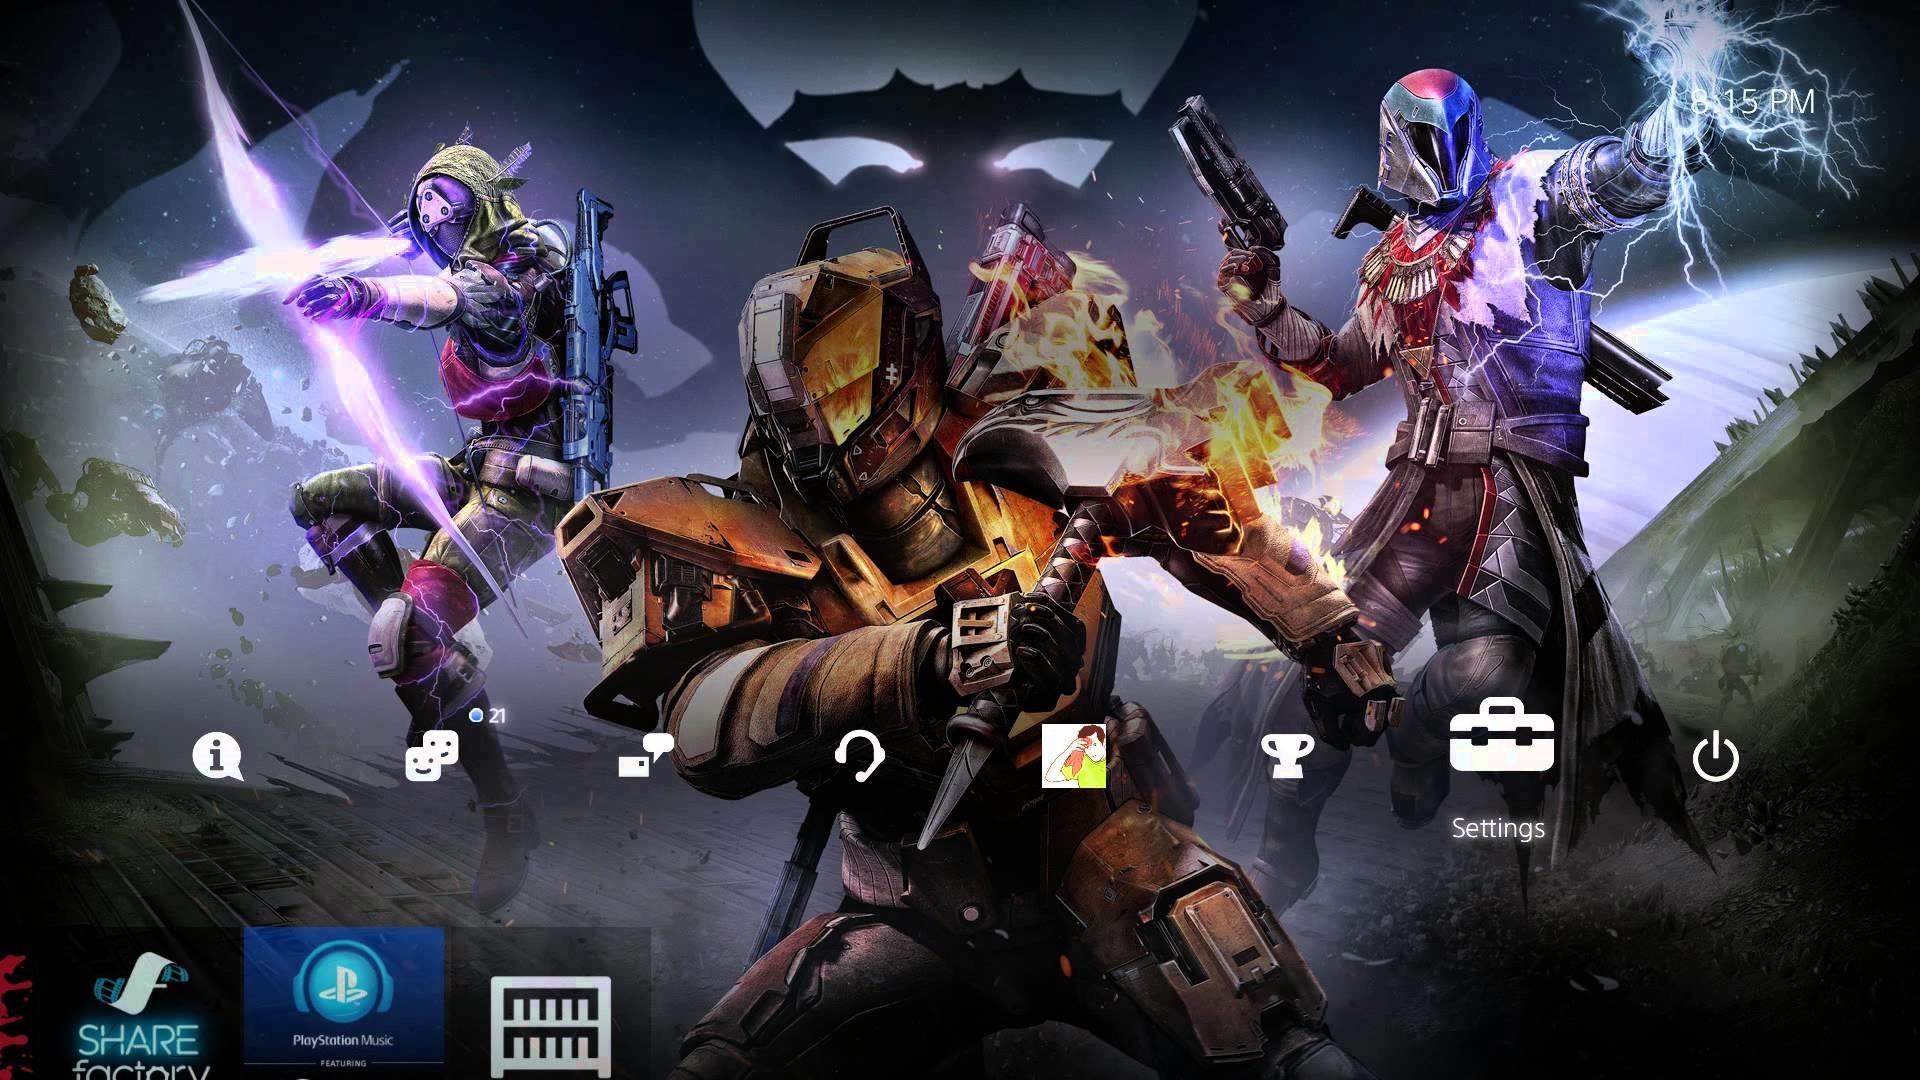 [Pre-Order] Destiny: The Taken King [PS4 Theme] – YouTube